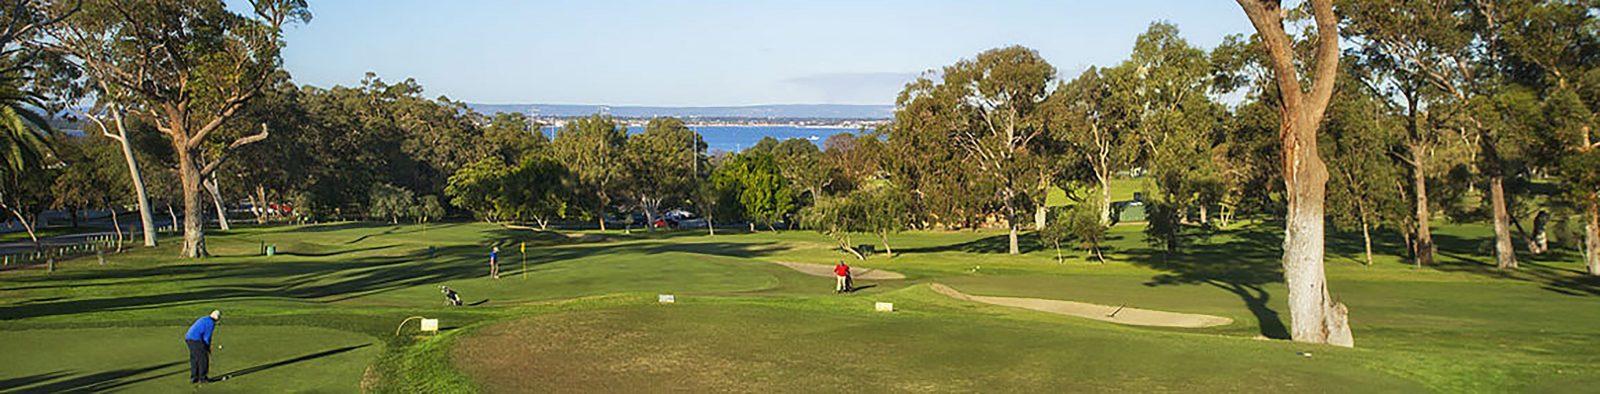 Nedlands Golf Club, Nedlands, Western Australia